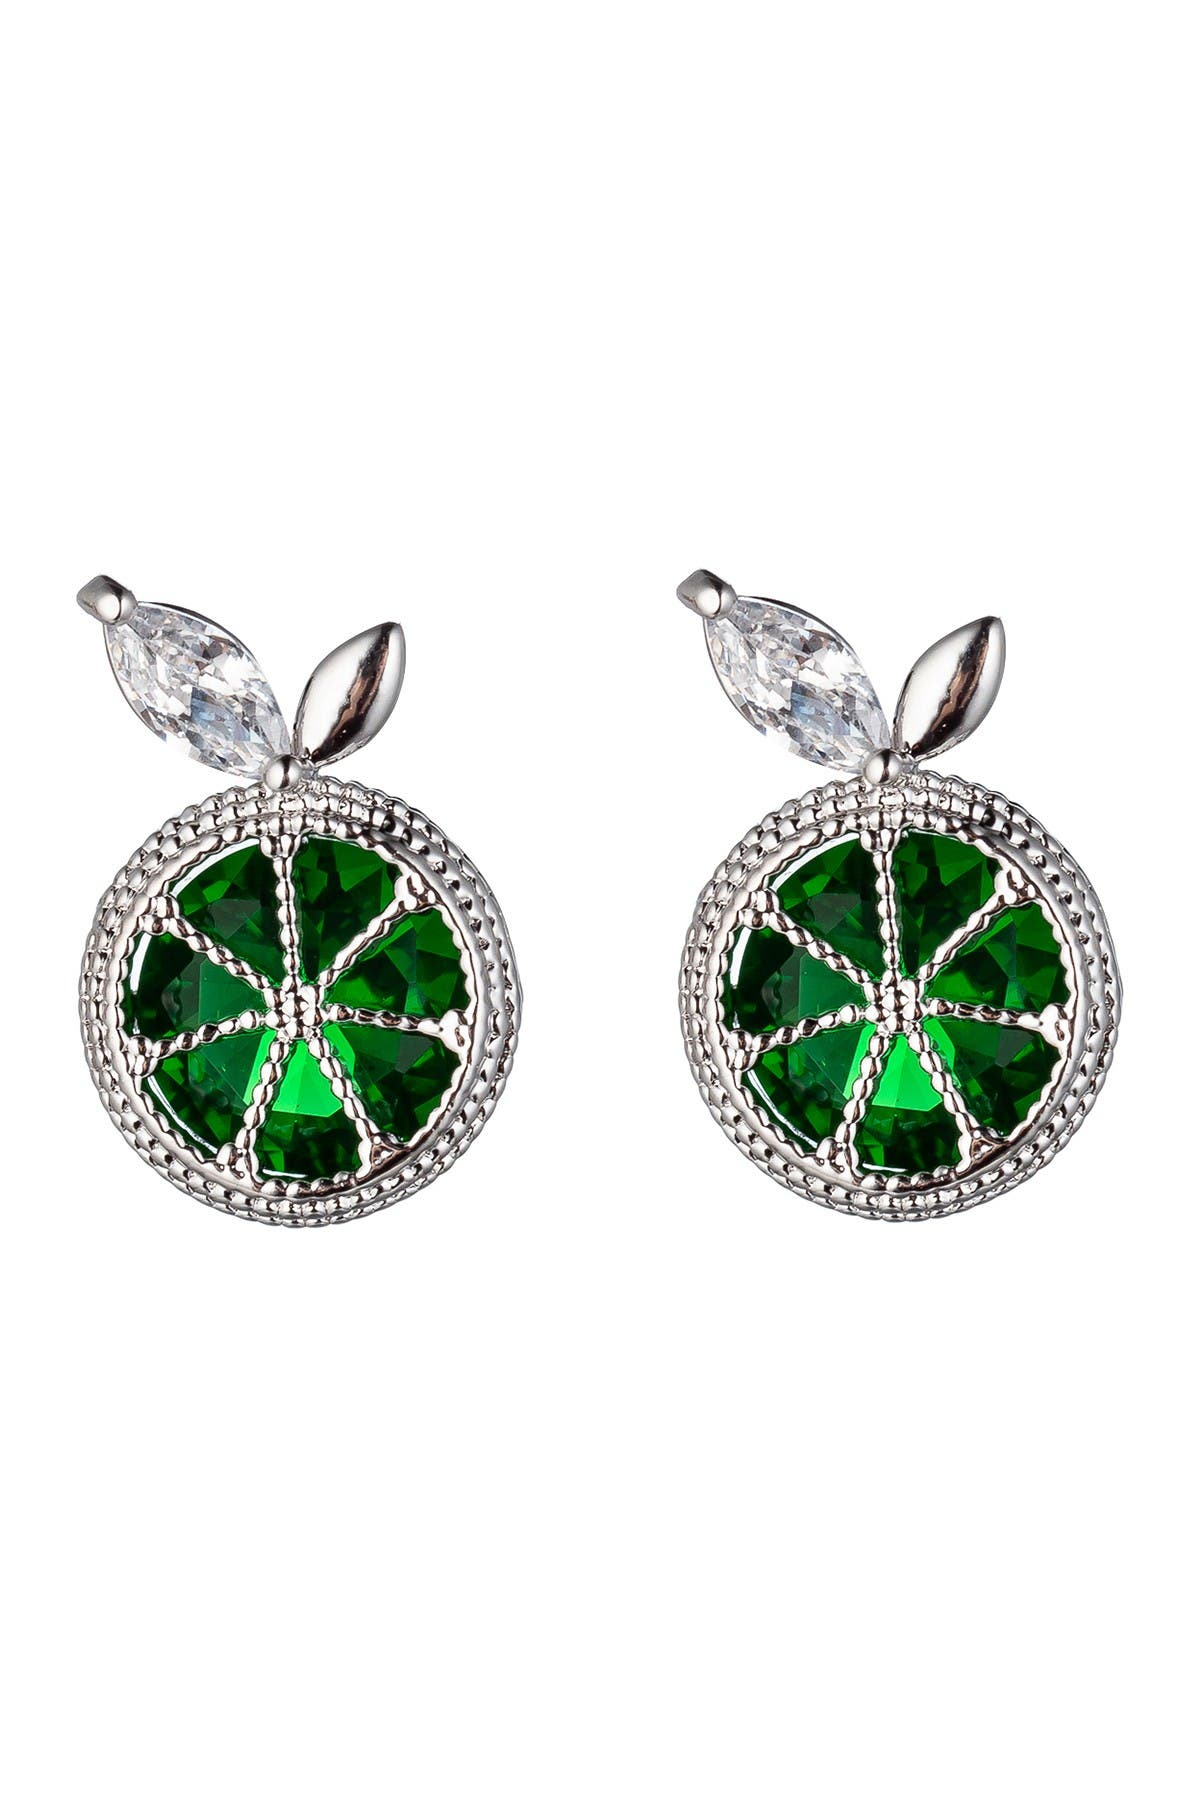 Image of Eye Candy Los Angeles Sina Brass Green Lime Slice CZ Crystal Stud Earrings